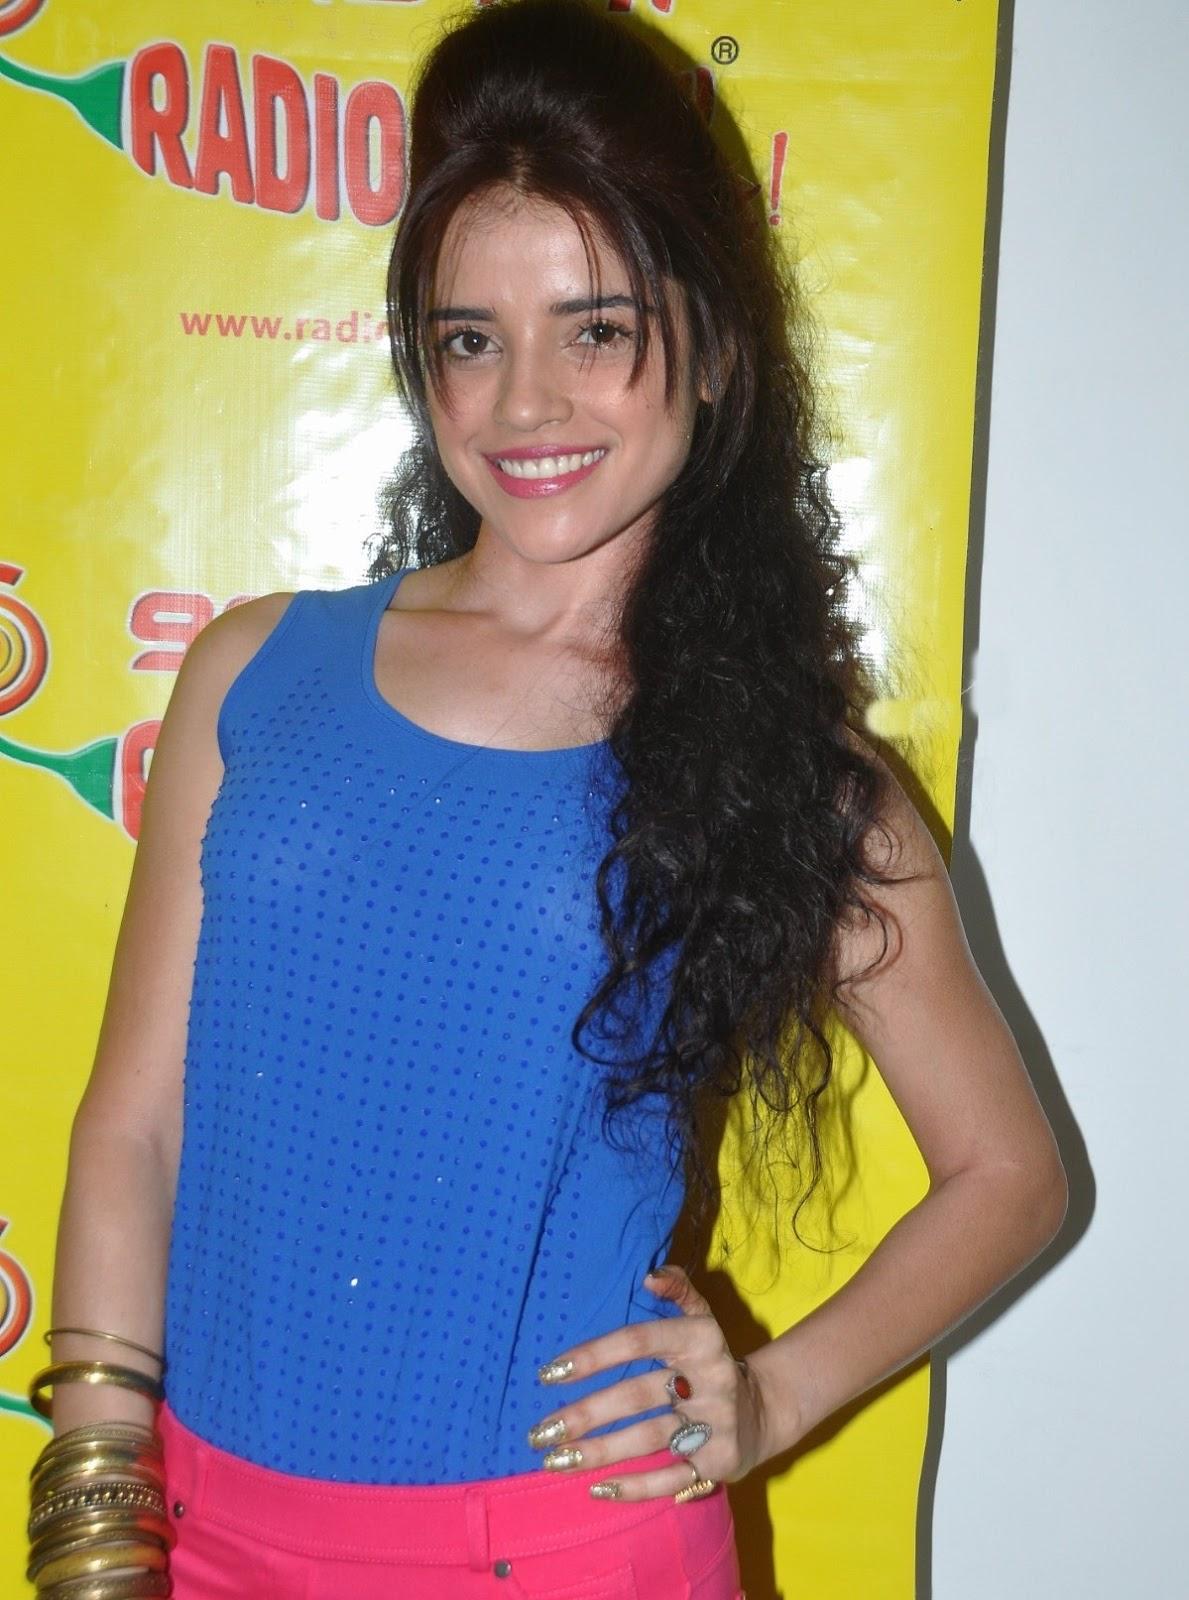 http://4.bp.blogspot.com/-aVyacv5LQr0/UT6wq0_X9SI/AAAAAAAAYF0/2ZzGwzG9xCw/s1600/Actress+Piaa+Bajpai+New+super+Images.jpg